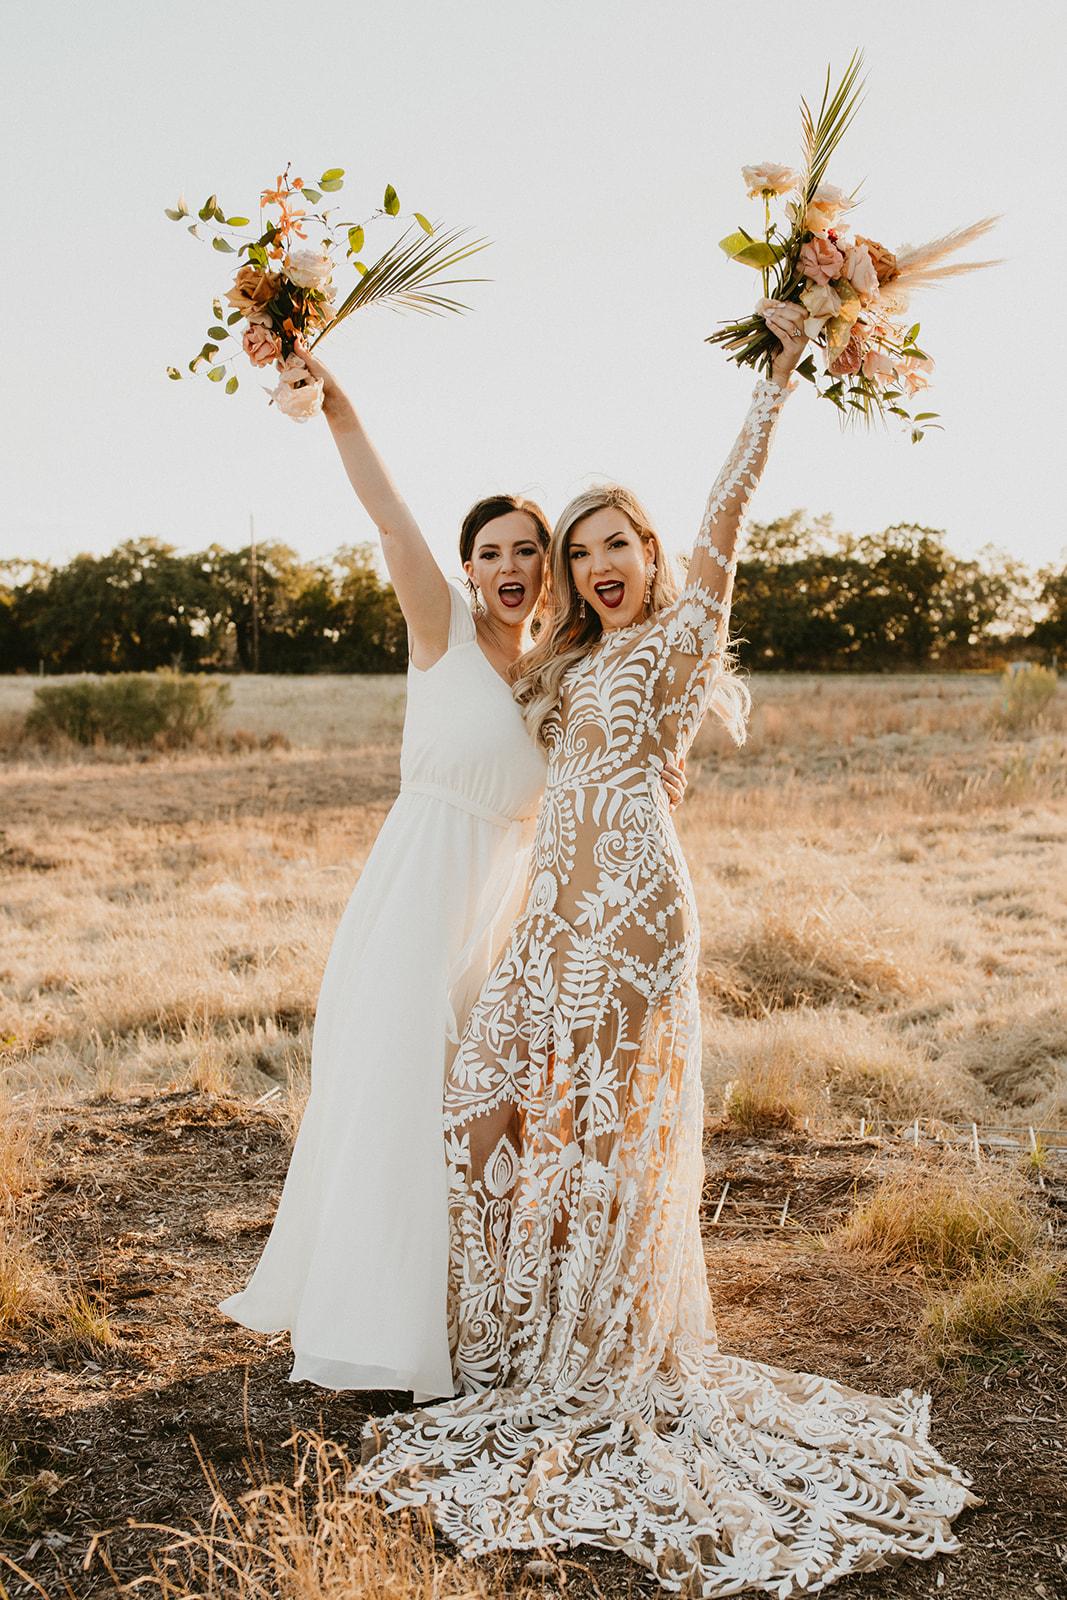 Tropical Colorful Frond Bridesmaid + Bride Bouquets + White Creamy Bridesmaid Dresses + Rue De Seine Wedding Dress + Boho Wedding + sisters